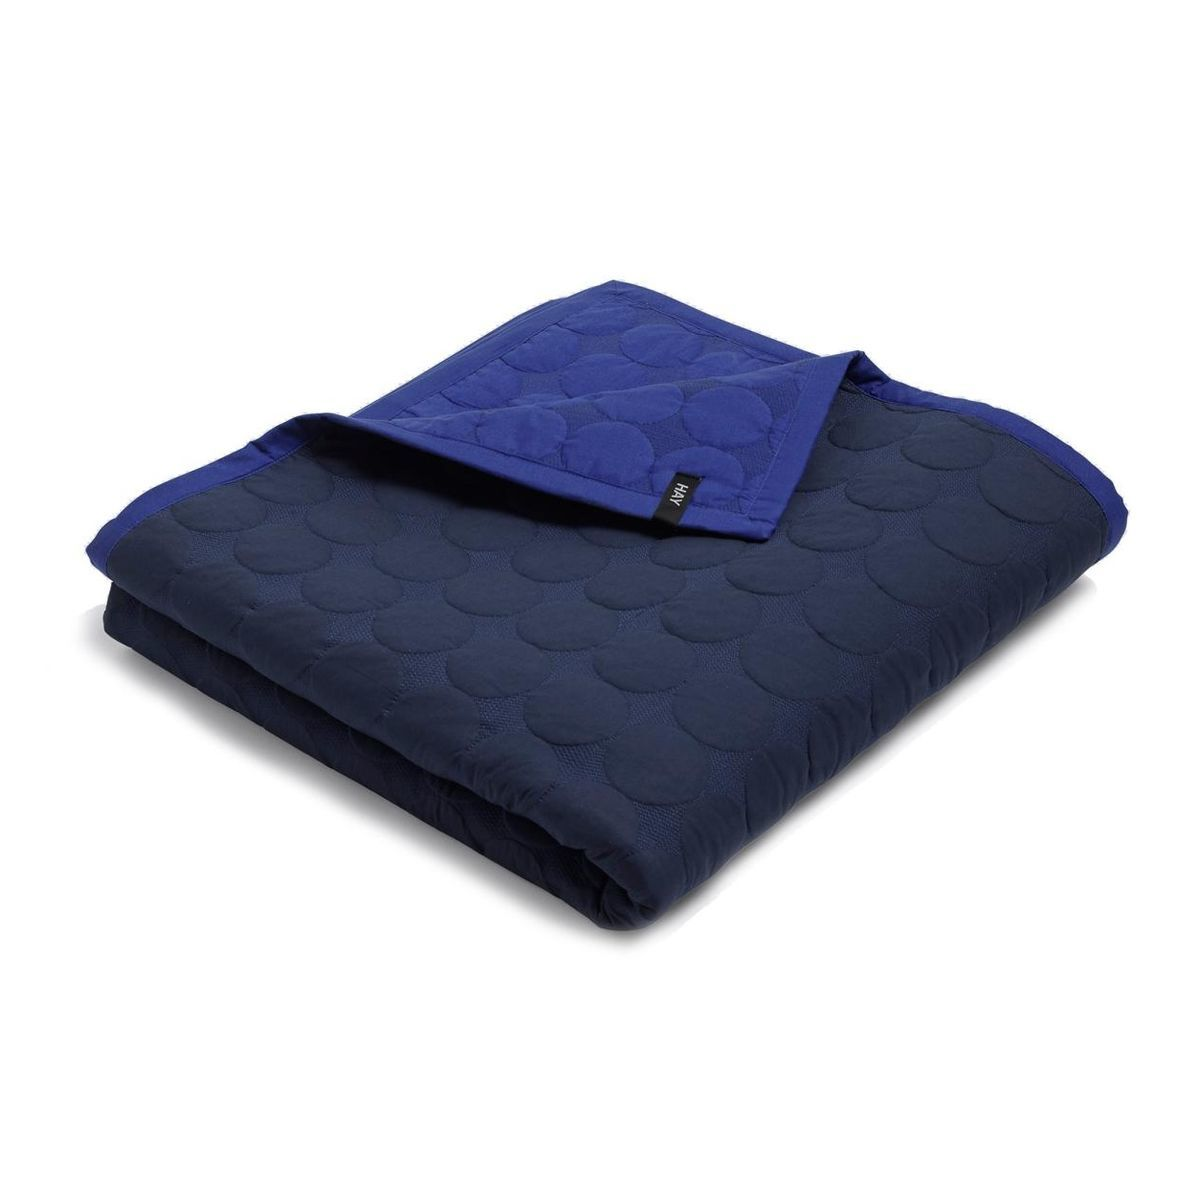 hay mega dot quilt tagesdecke blau 195x245cm. Black Bedroom Furniture Sets. Home Design Ideas